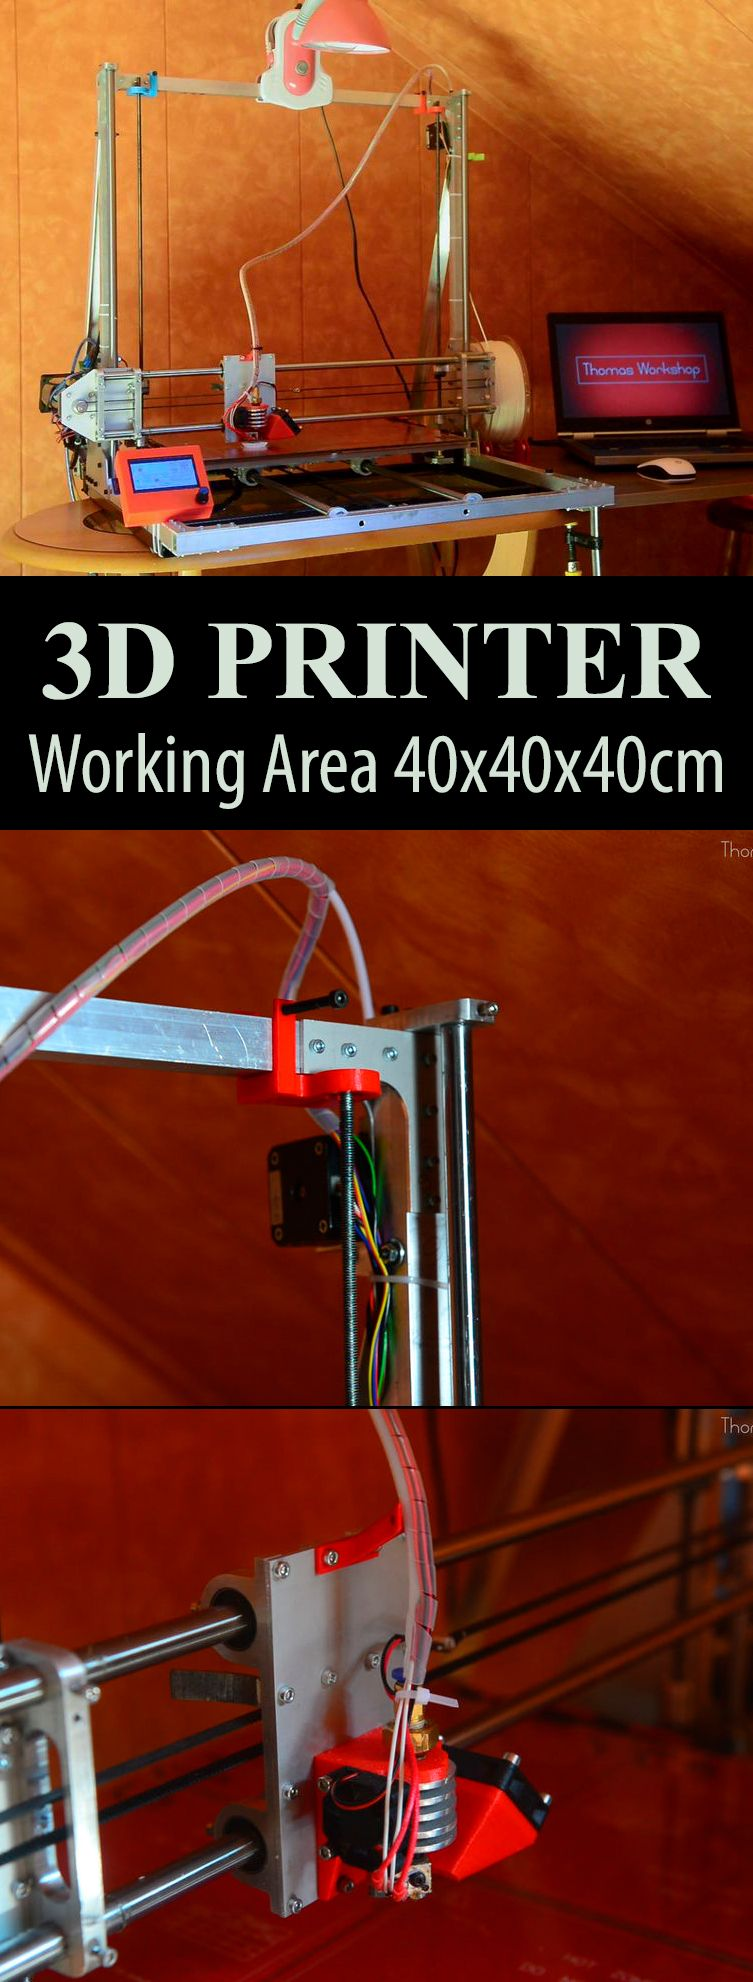 3d printer working area 40x40x40cm build a 3d printer